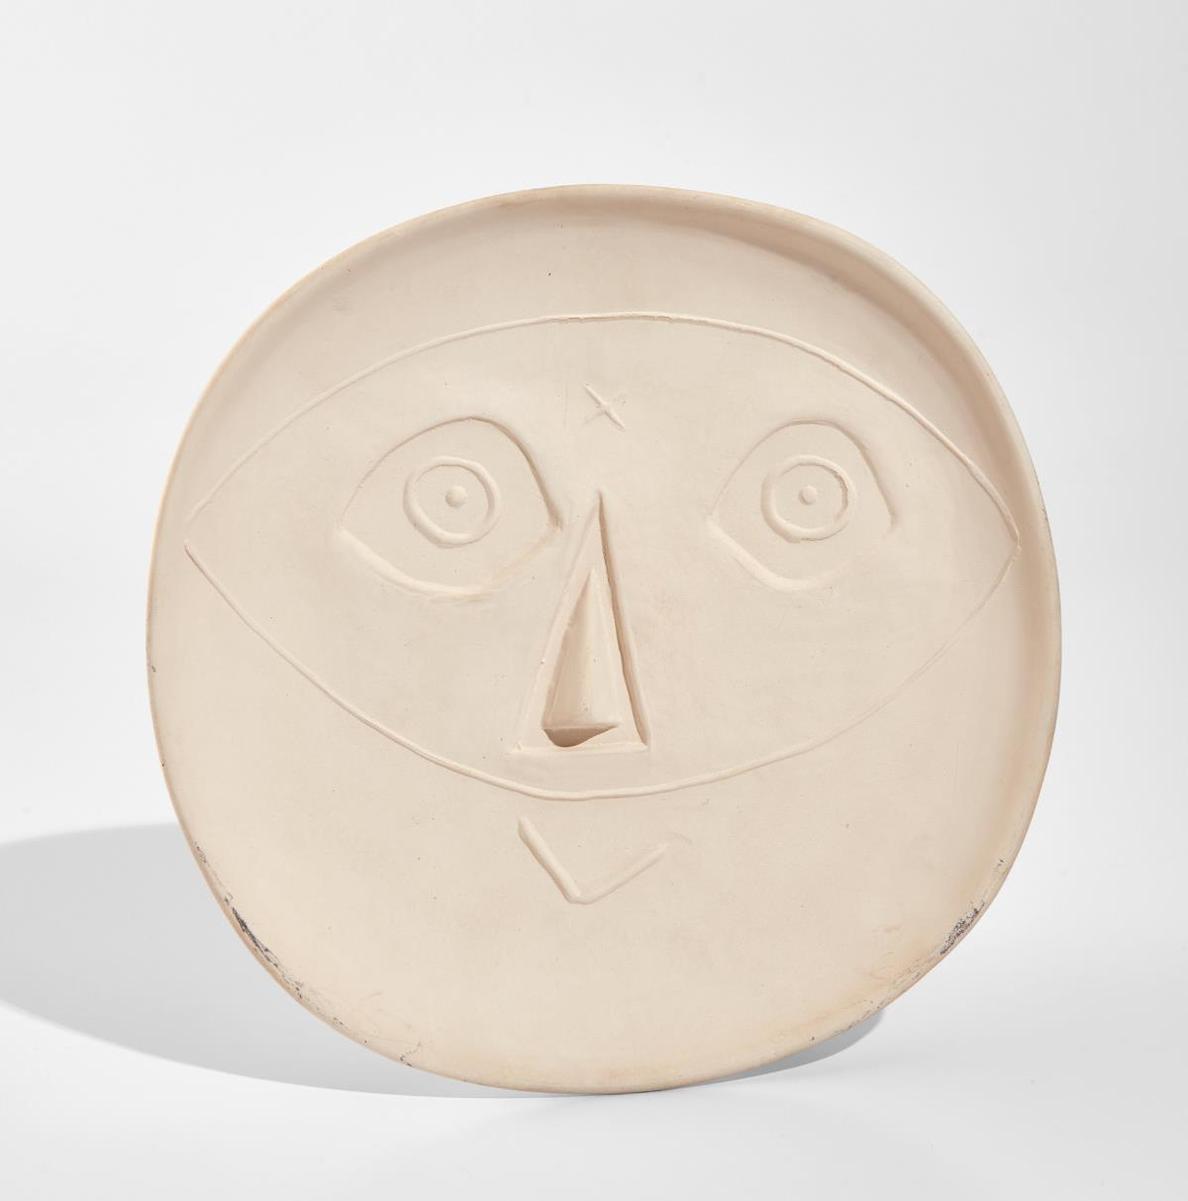 Pablo Picasso-Head With Mask (Tete Au Masque)-1956